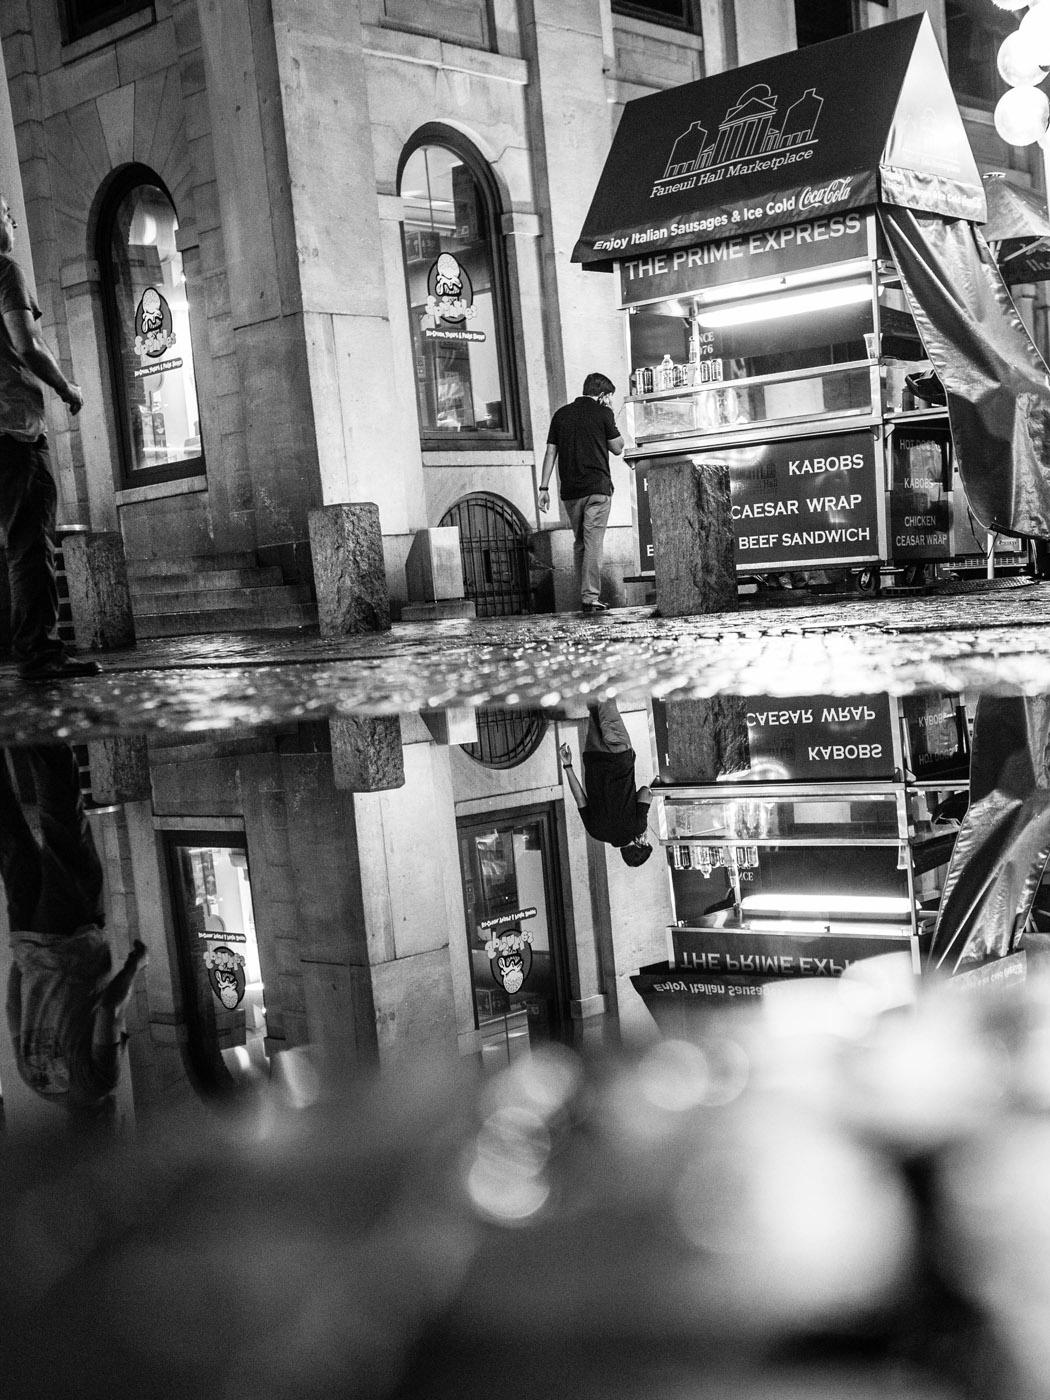 Reflection (c) Joe Gallagher